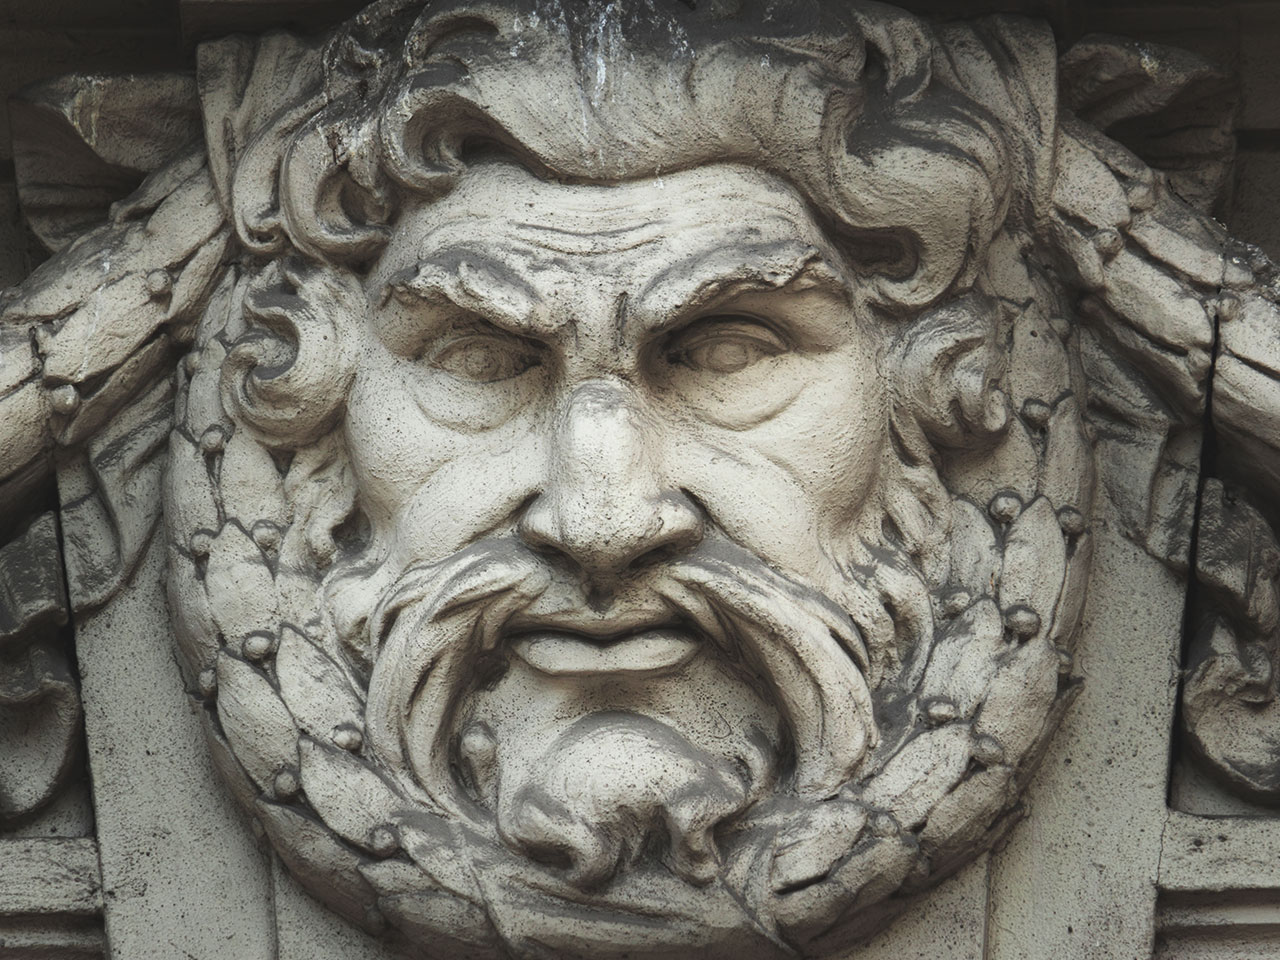 Операторы Zeus Sphinx возобновили активность